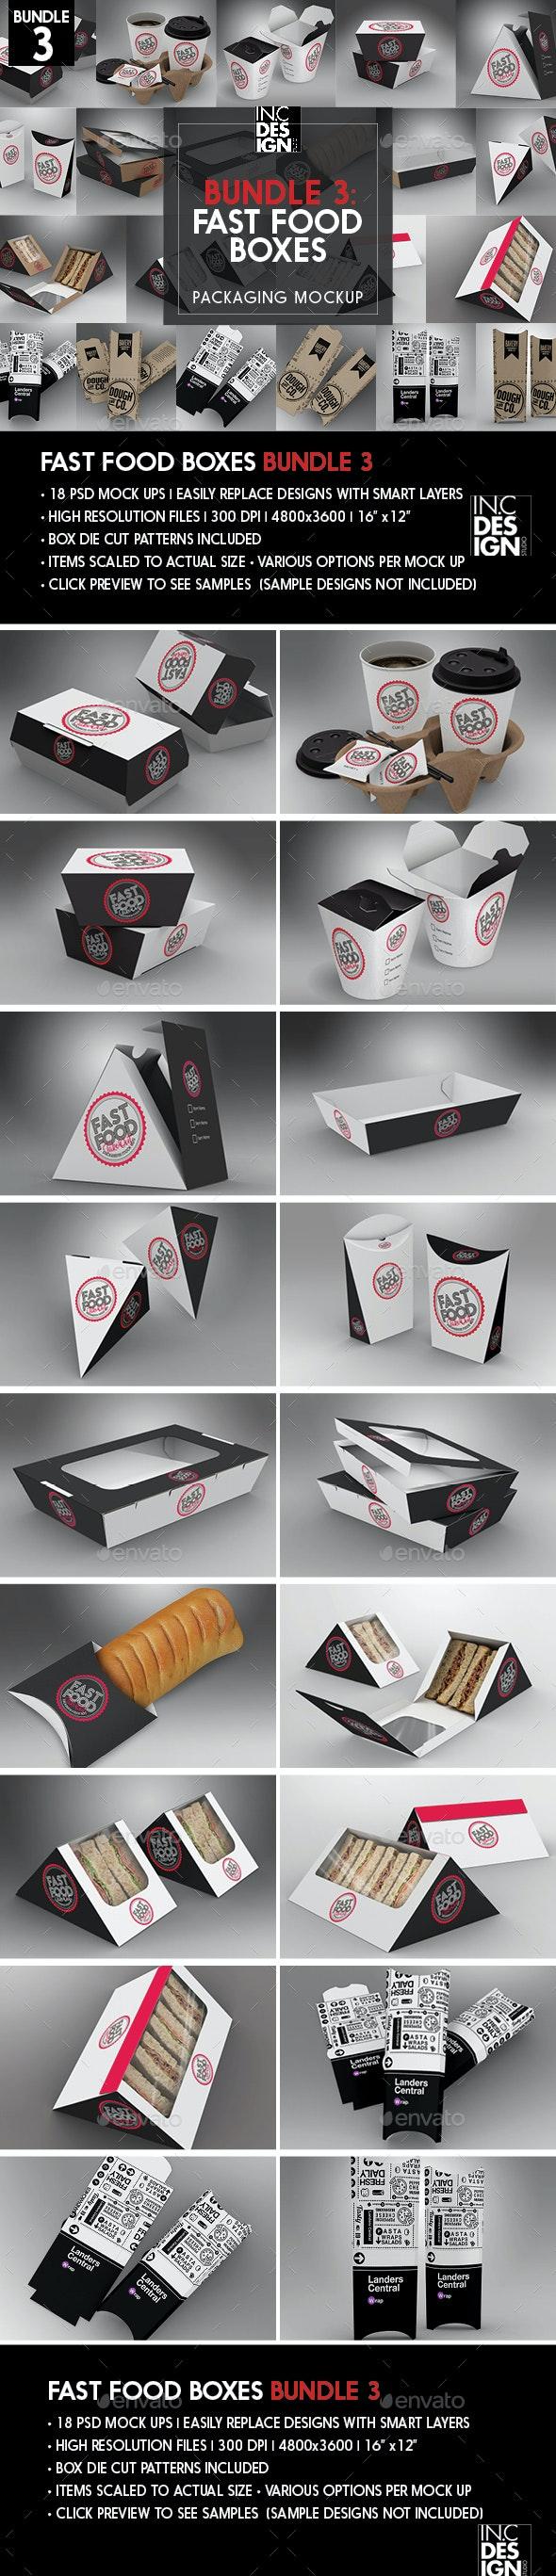 Fast Food Boxes Mock Up Bundle 3 - Food and Drink Packaging